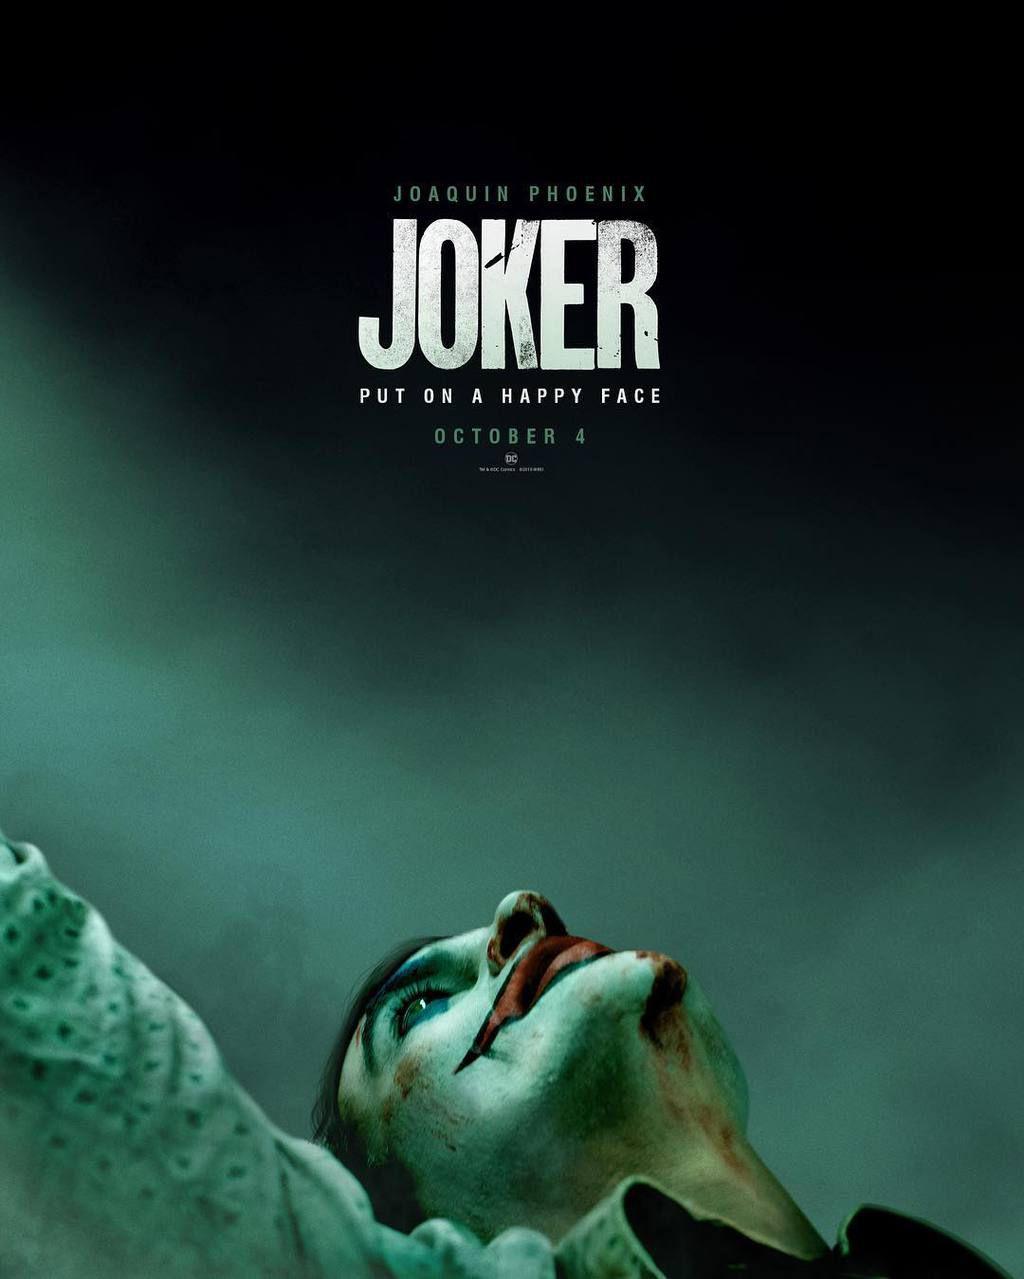 affiche officielle du film Joker de Todd Phillips